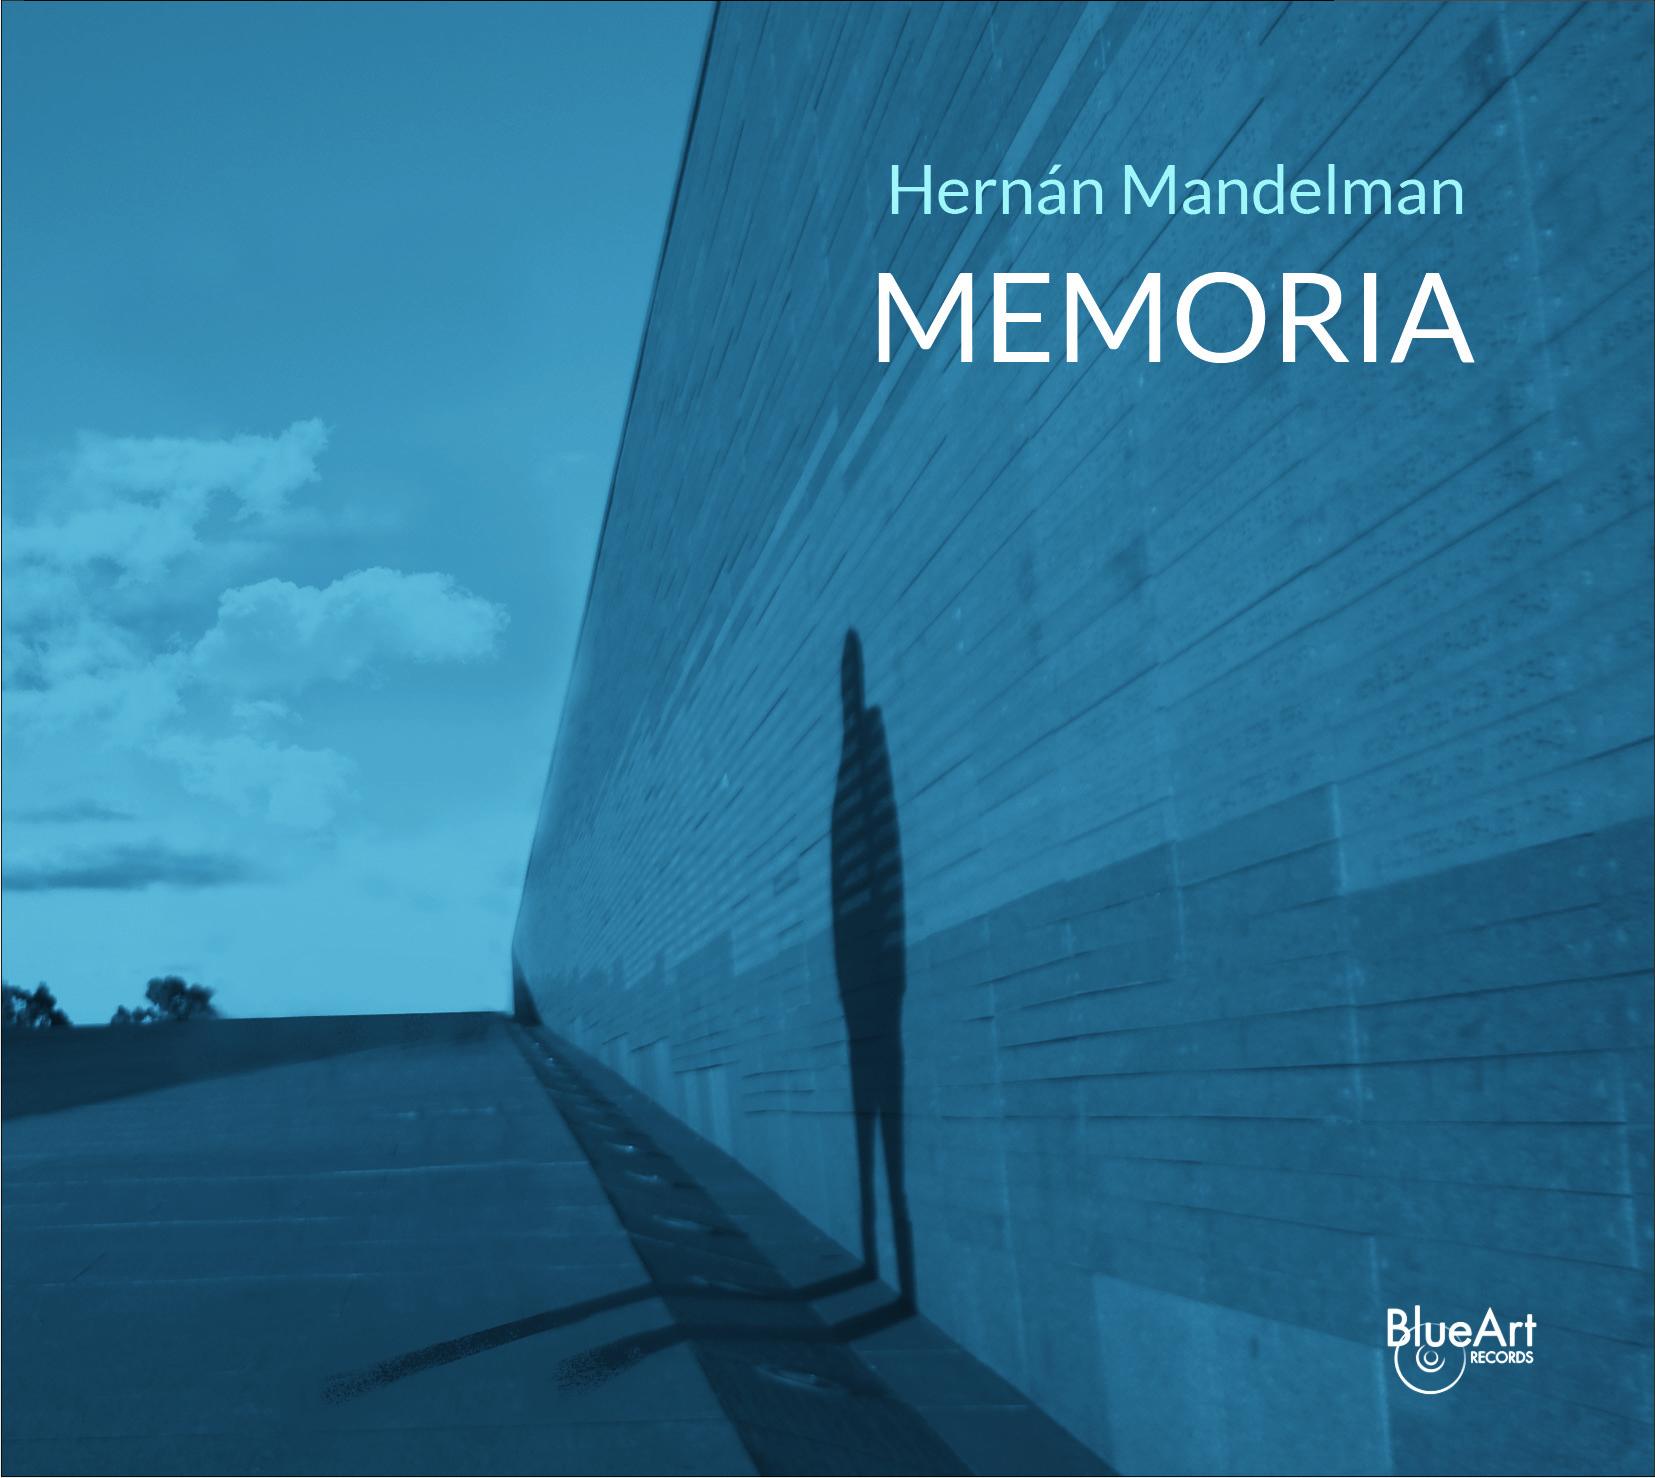 HERNÁN MANDELMAN presenta su tercer disco: MEMORIA